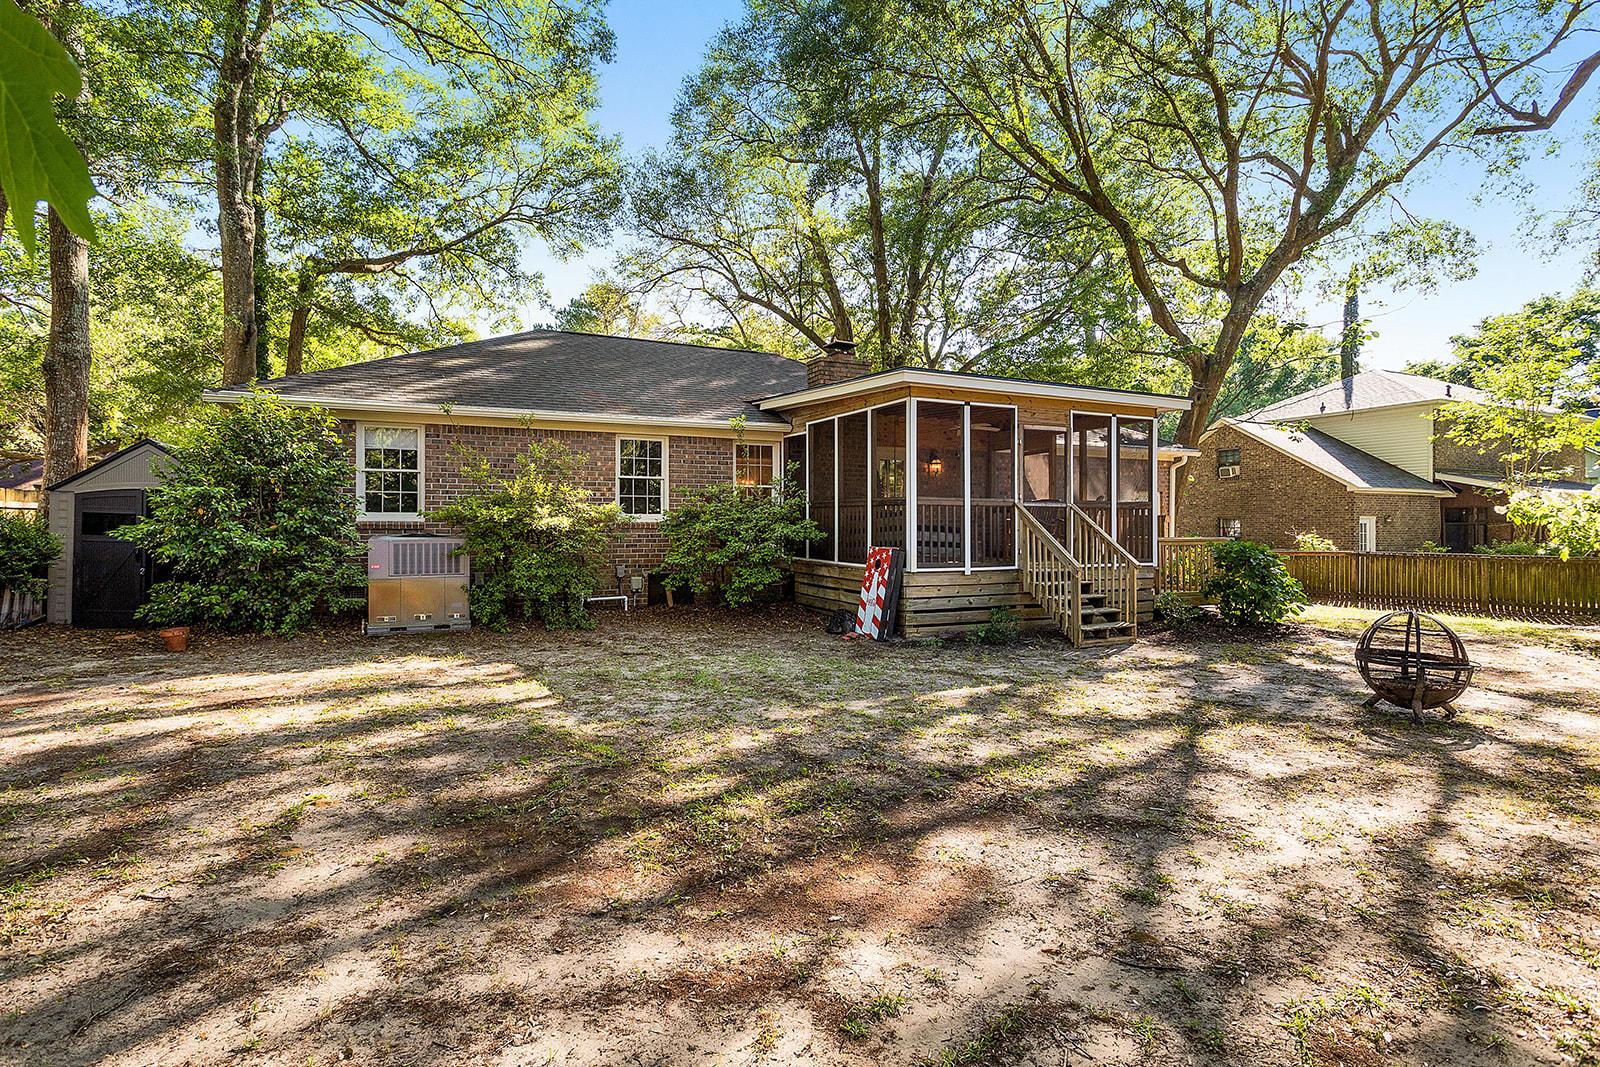 Shemwood II Homes For Sale - 954 Sea Gull, Mount Pleasant, SC - 8